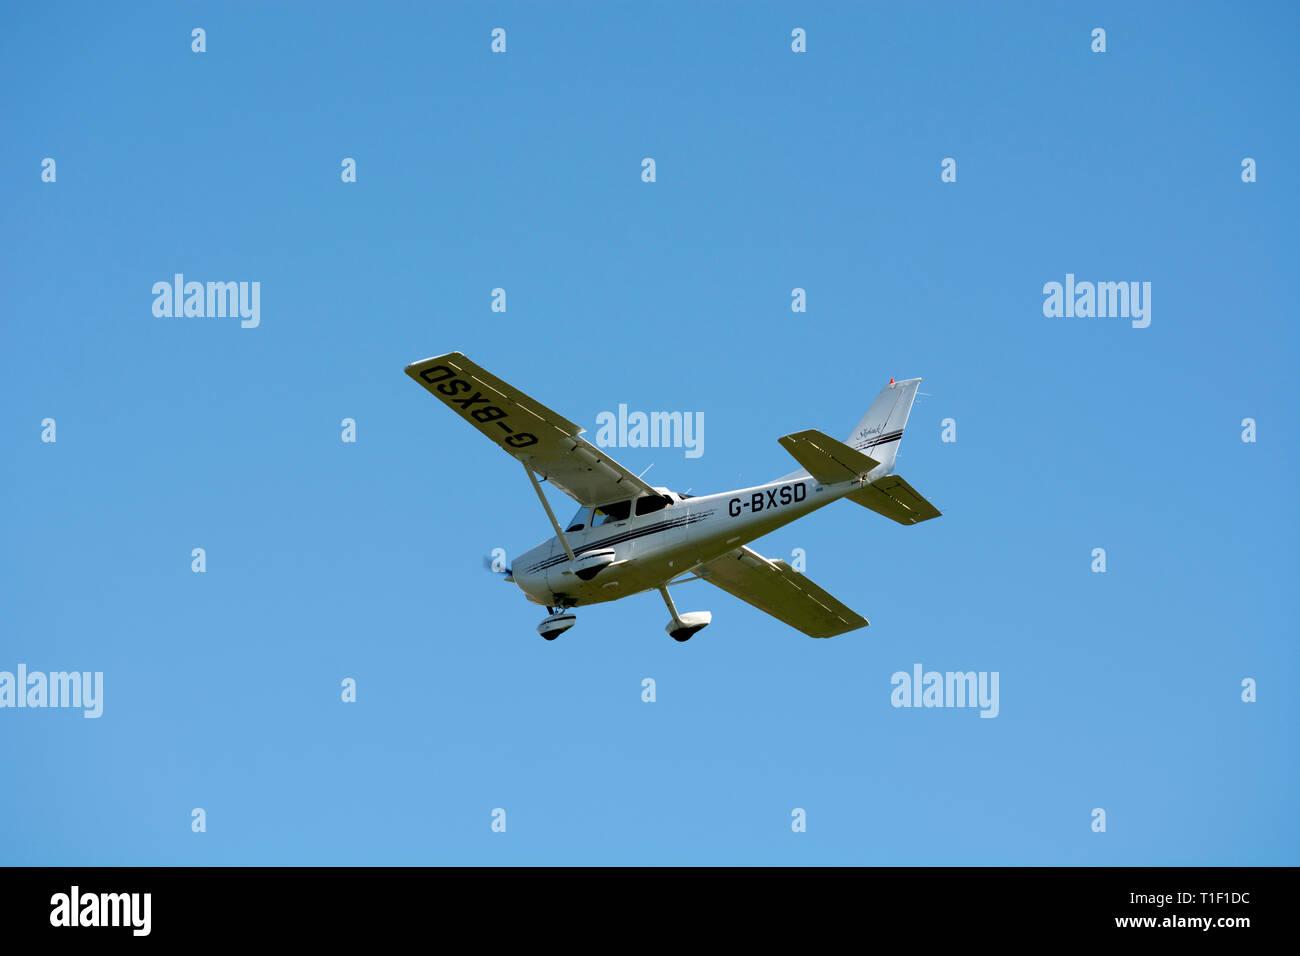 Cessna 172 Plane Stock Photos & Cessna 172 Plane Stock Images - Alamy